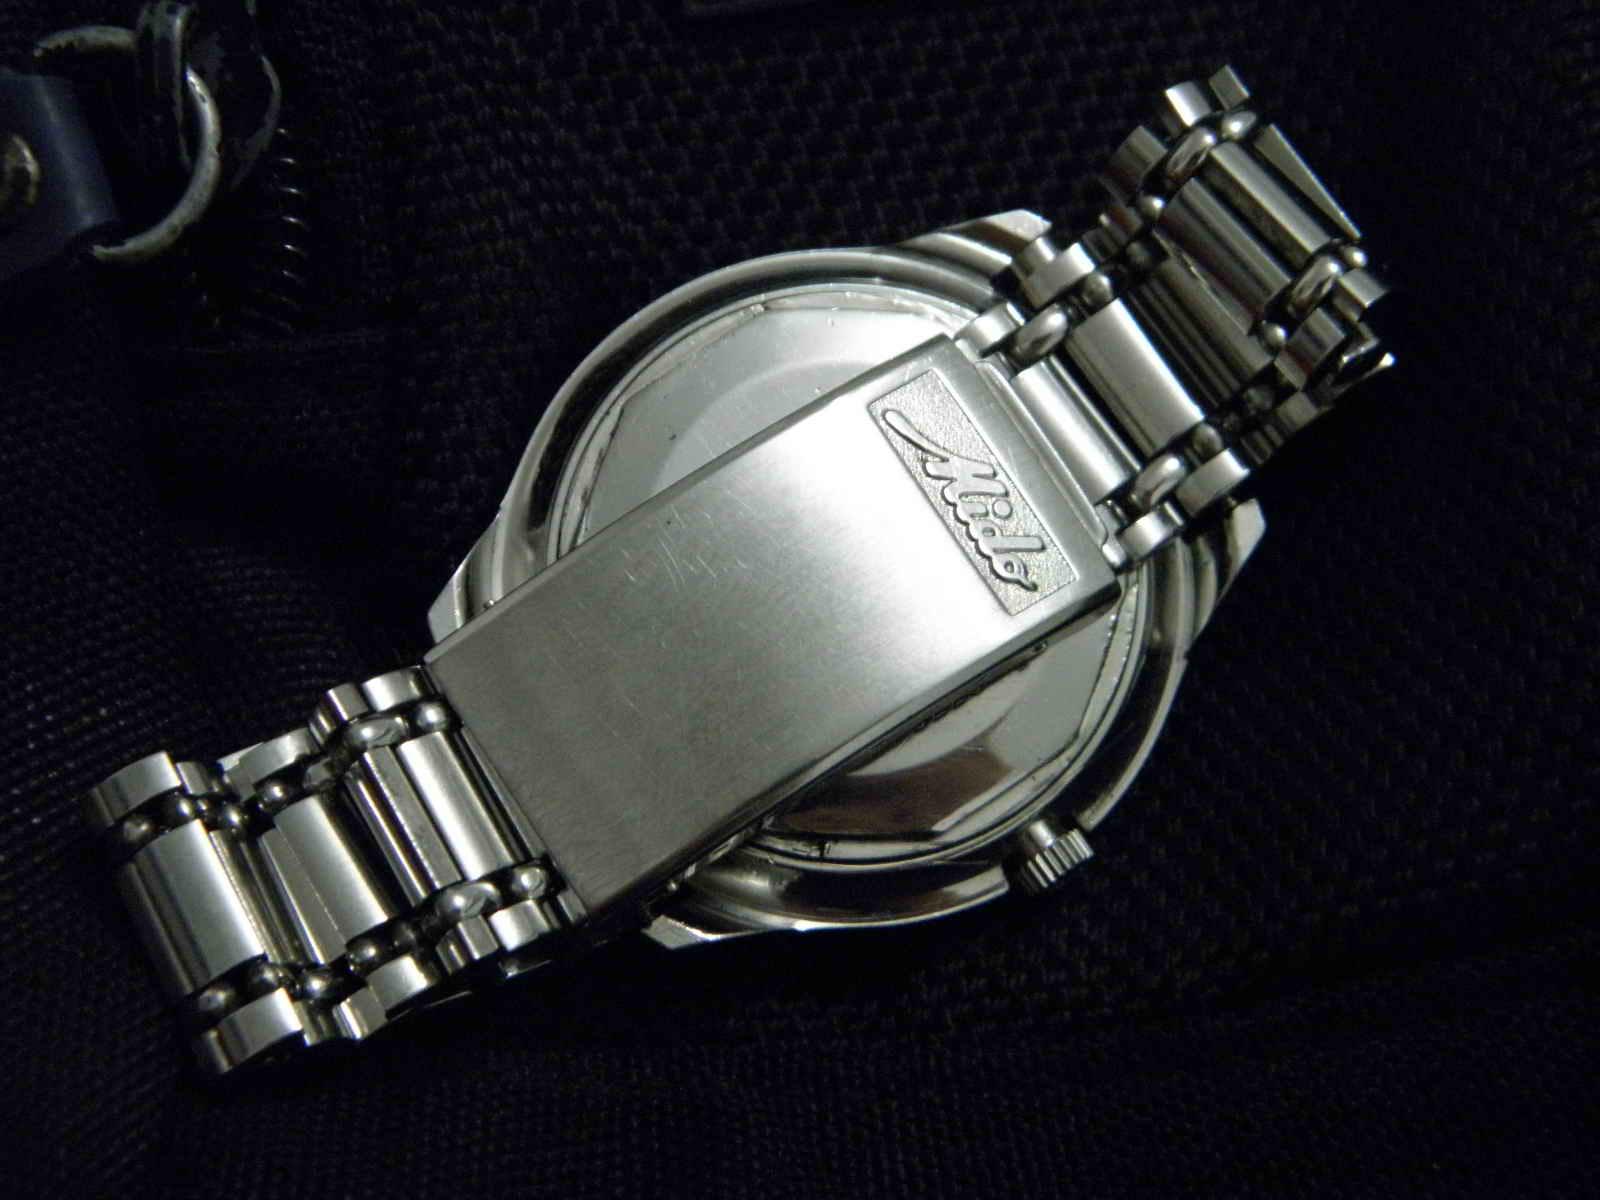 Kiosku Sold Mido Commander 2 Charles Jourdan 1016 1312c Hitam Ring Silver Plat Putih Dial Steel Senada Dengan Case Dan Bracelet Mika Aftermarket Logo Masih Nyaman Utk Lingkar 18 Cm